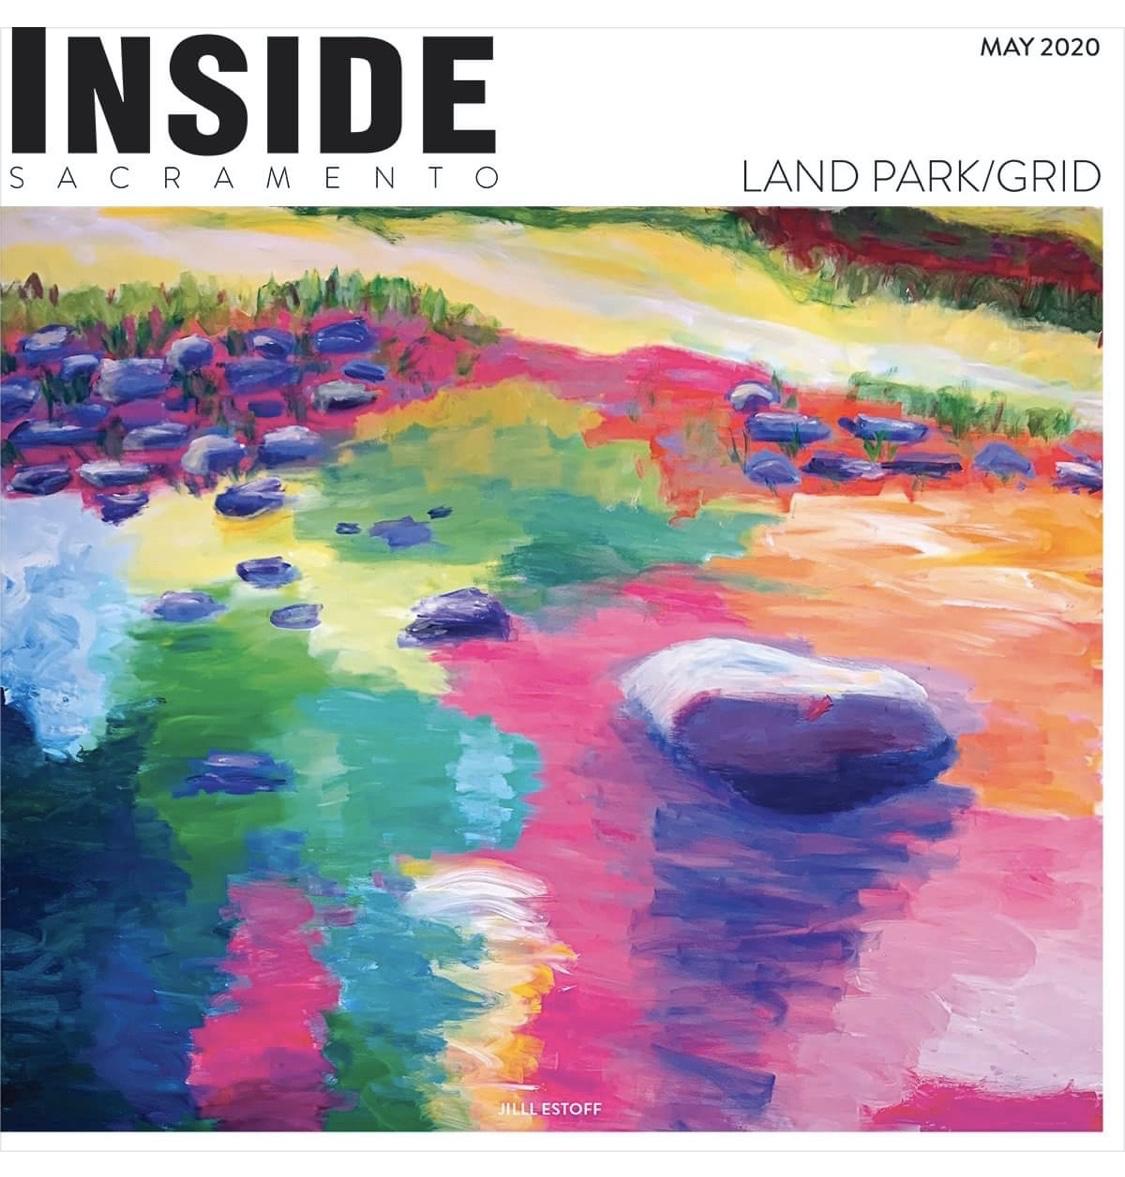 INSIDE May 2020